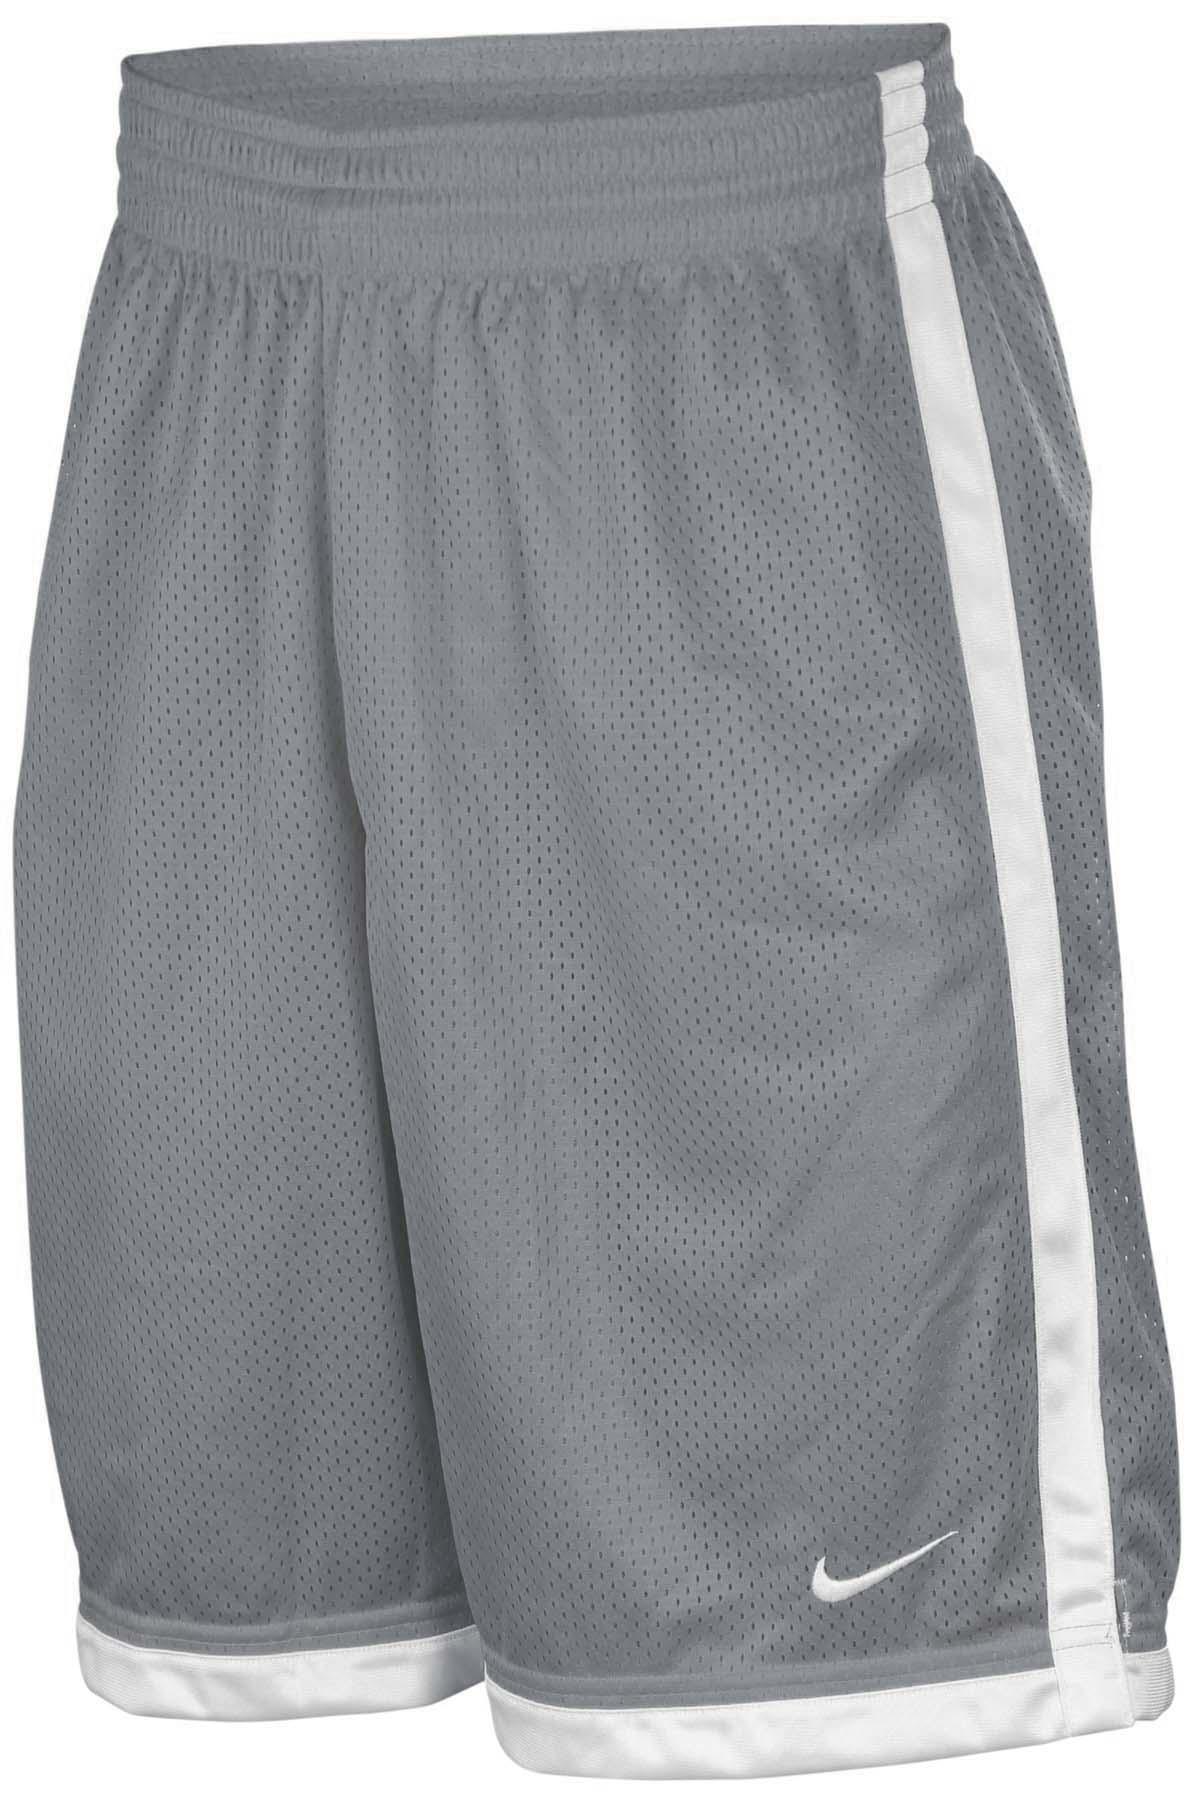 Nike Knit Basketball Short